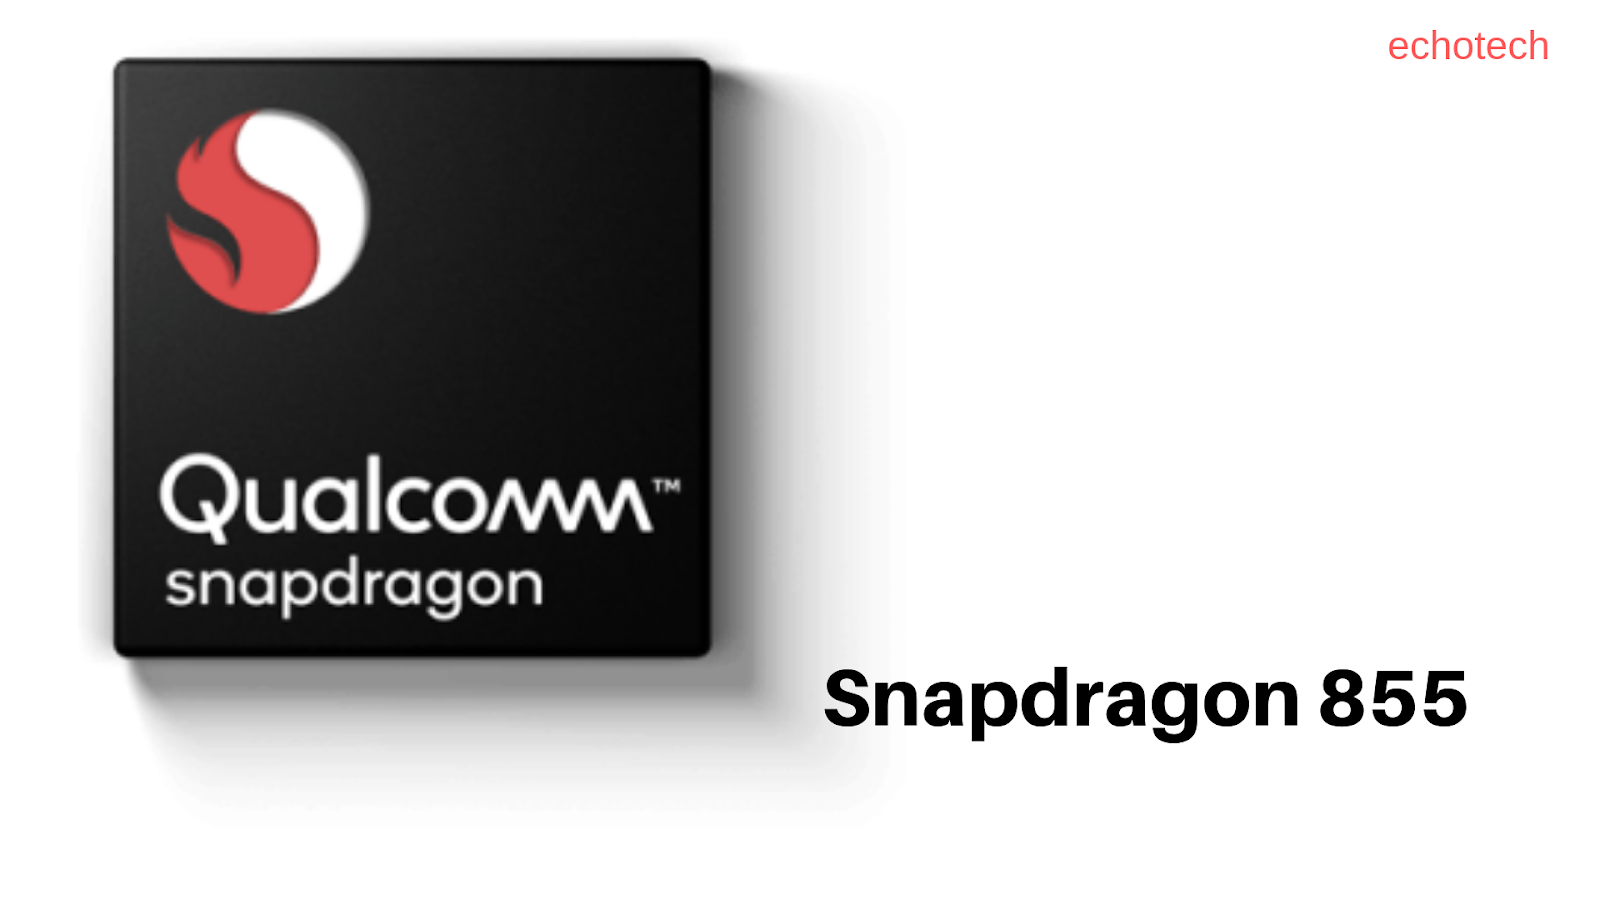 Snapdragon 855,World First 5G Chipset  - ECHO2TECH